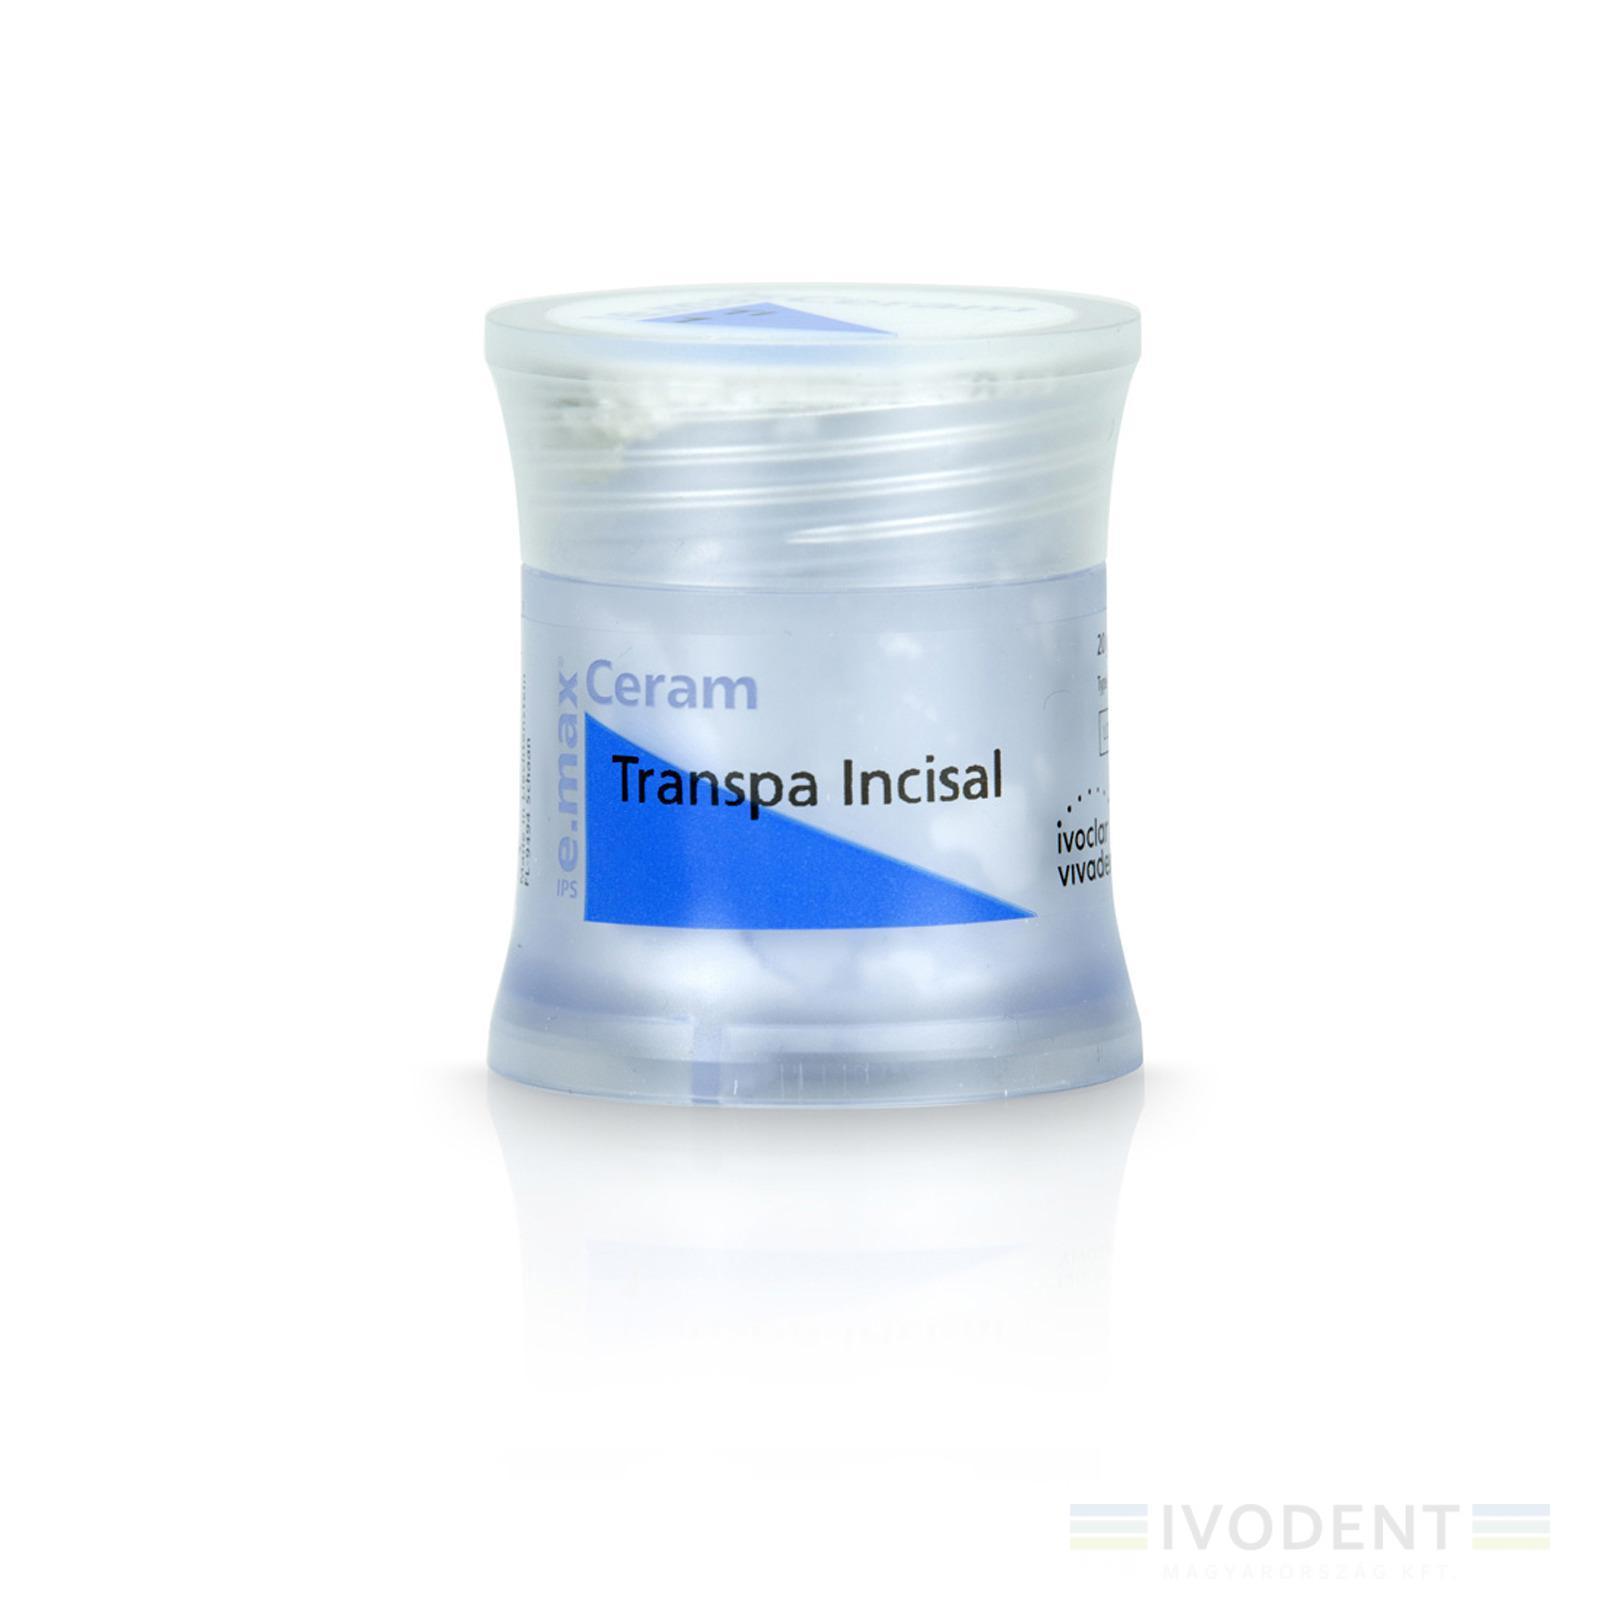 IPS e.max Ceram Transpa Incisal 20 g 1